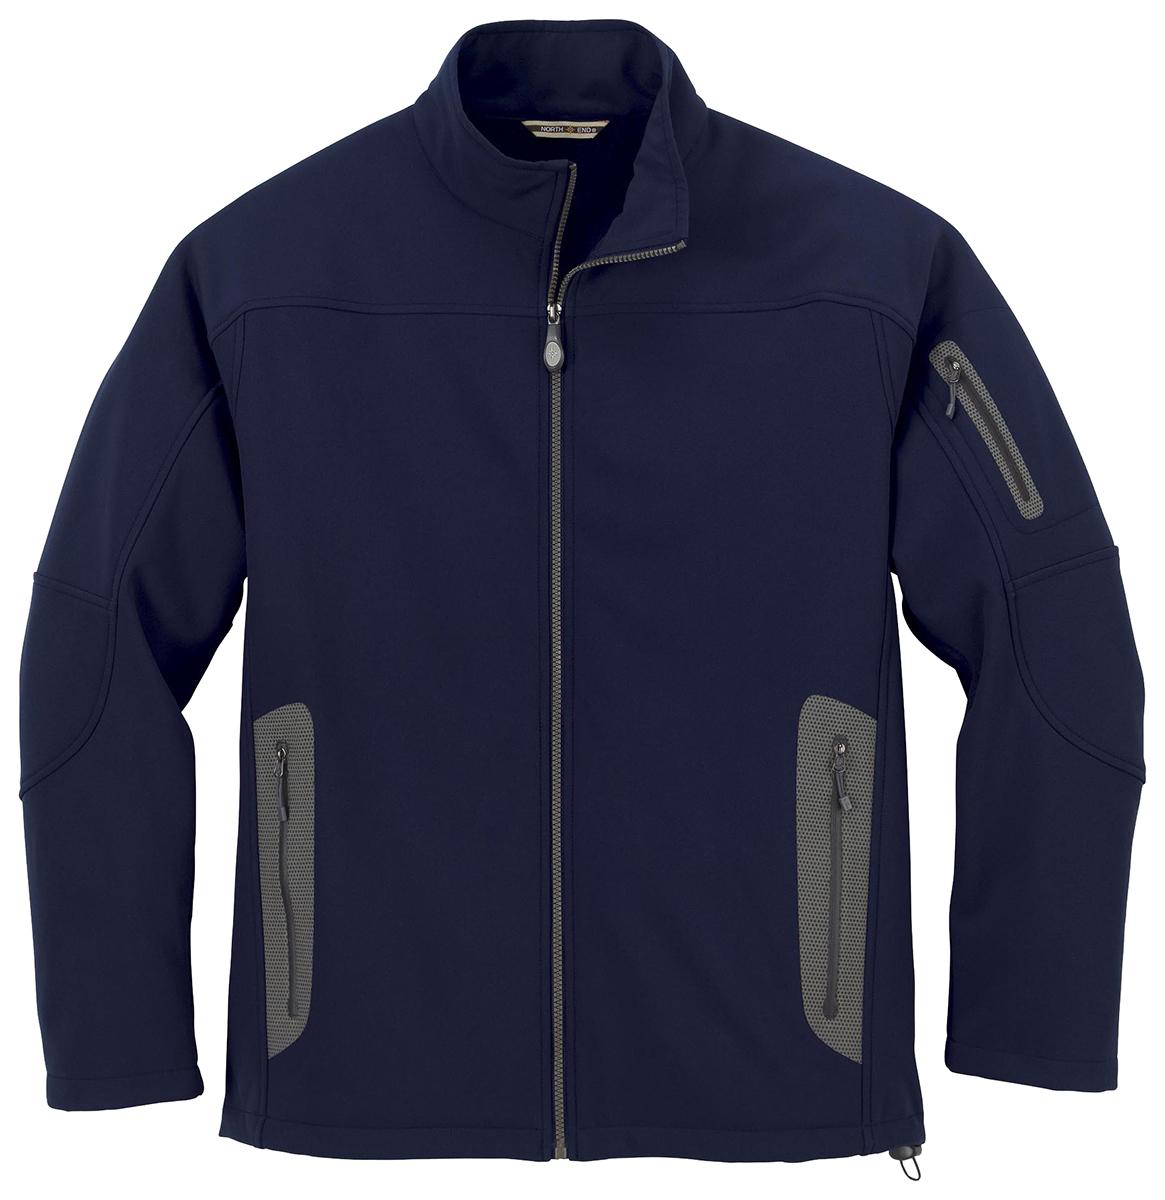 ClscNvy 4X North End Mens Soft Shell Hood Jacket